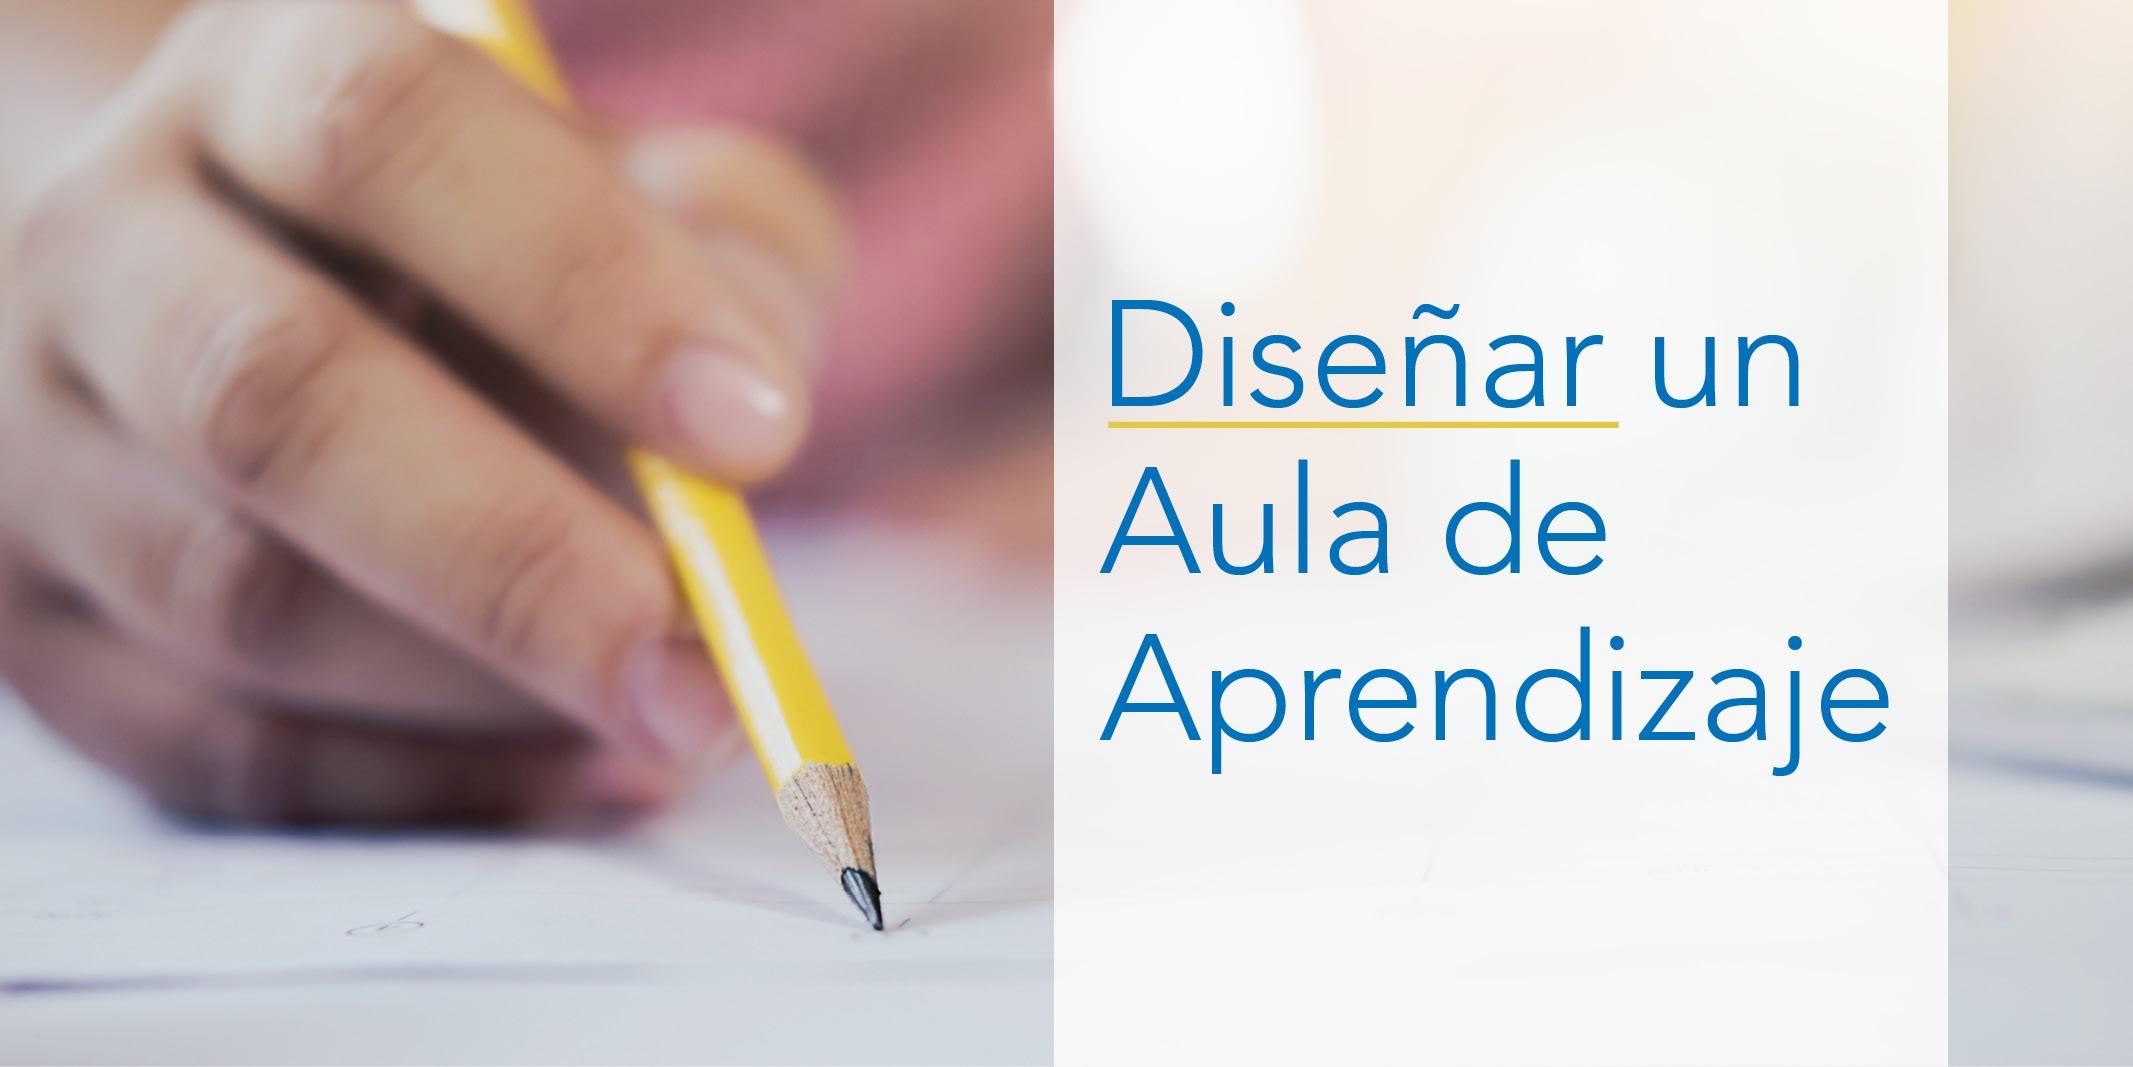 DiseñarUnAulaDeAprendizaje_esp.jpg